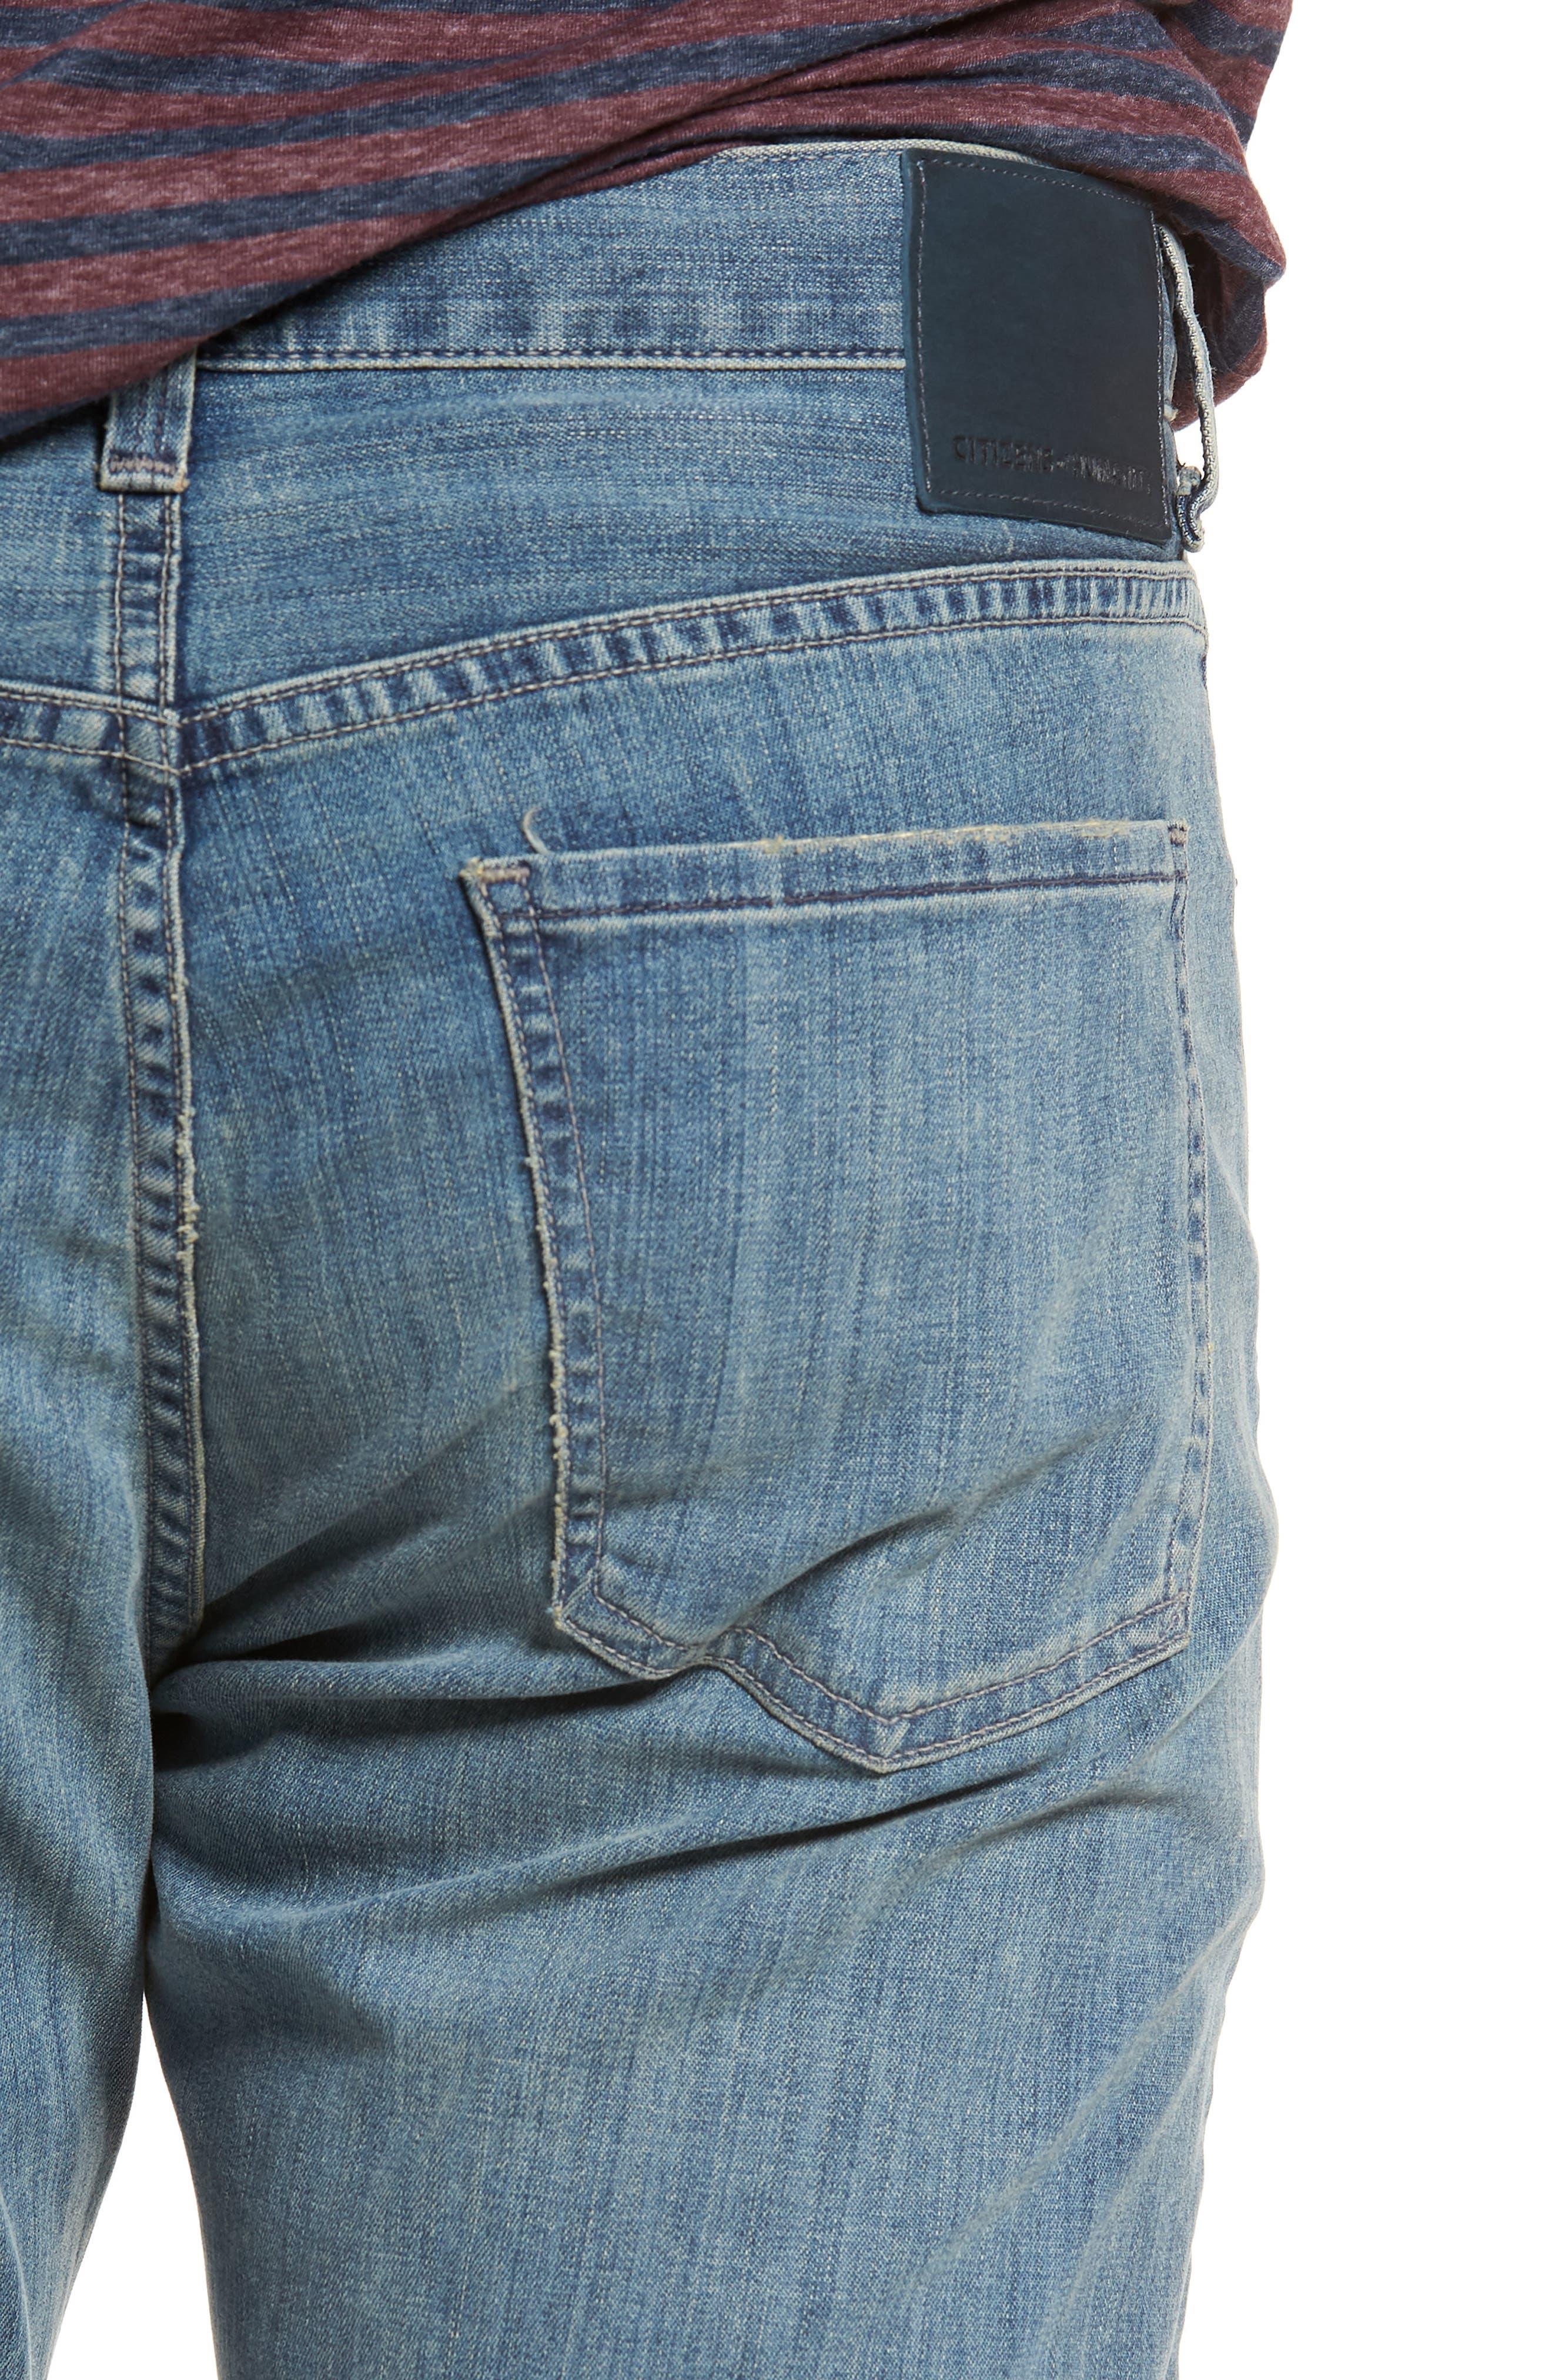 Gage Slim Straight Leg Jeans,                             Alternate thumbnail 4, color,                             Costa